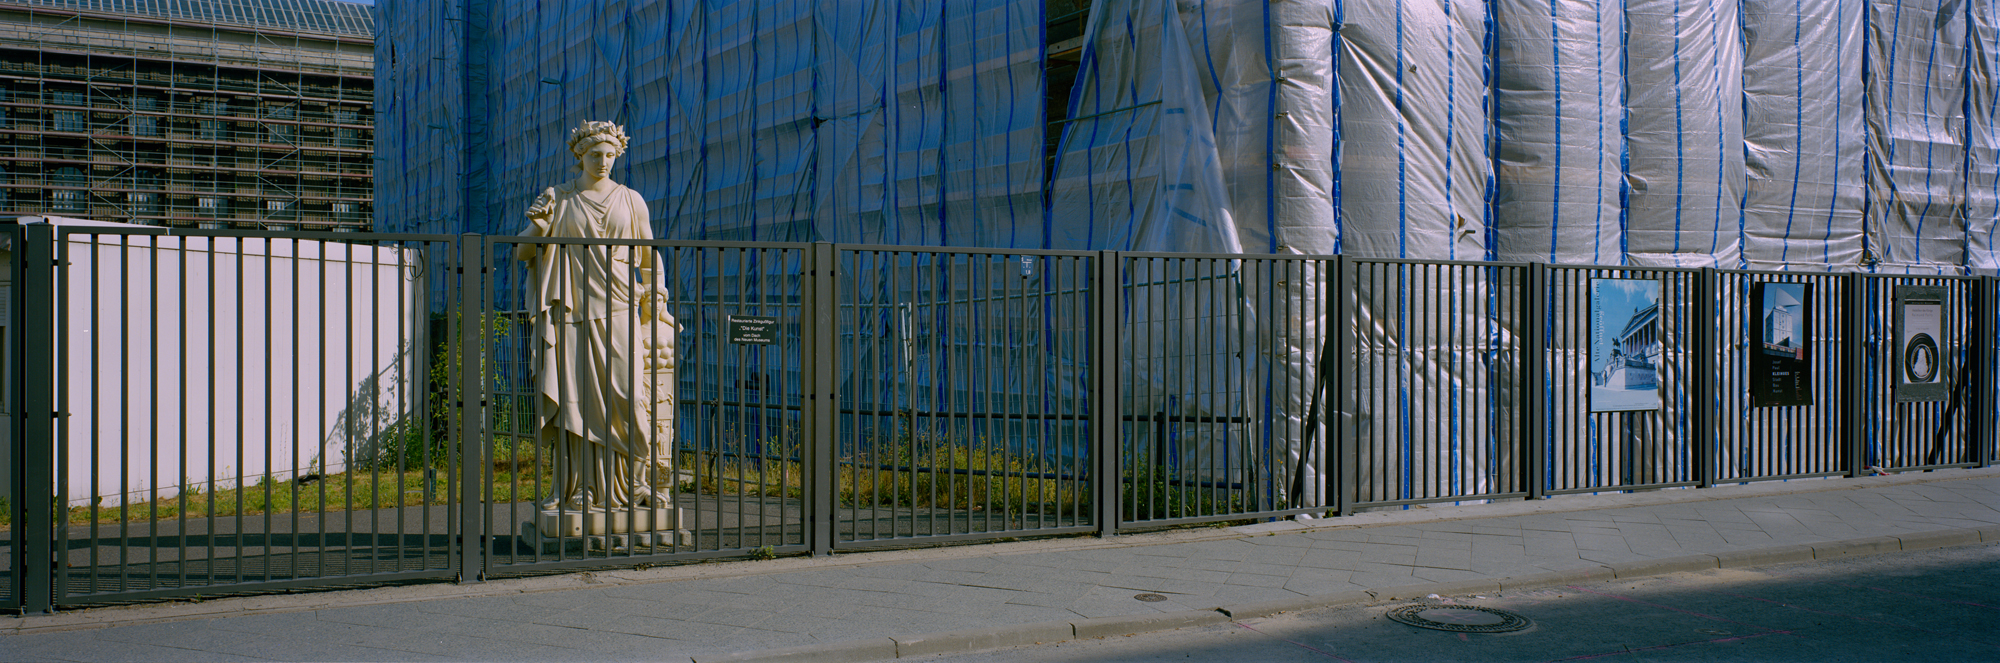 large format photography, Grossformatfotografie, Grossformatphotographie, Fotografie, Photographie, photography, 6x17, Berlin, Hauptstadt, capitol, city, Stadt, Architektur, architecture, Beton, Stahl, concrete, steel,